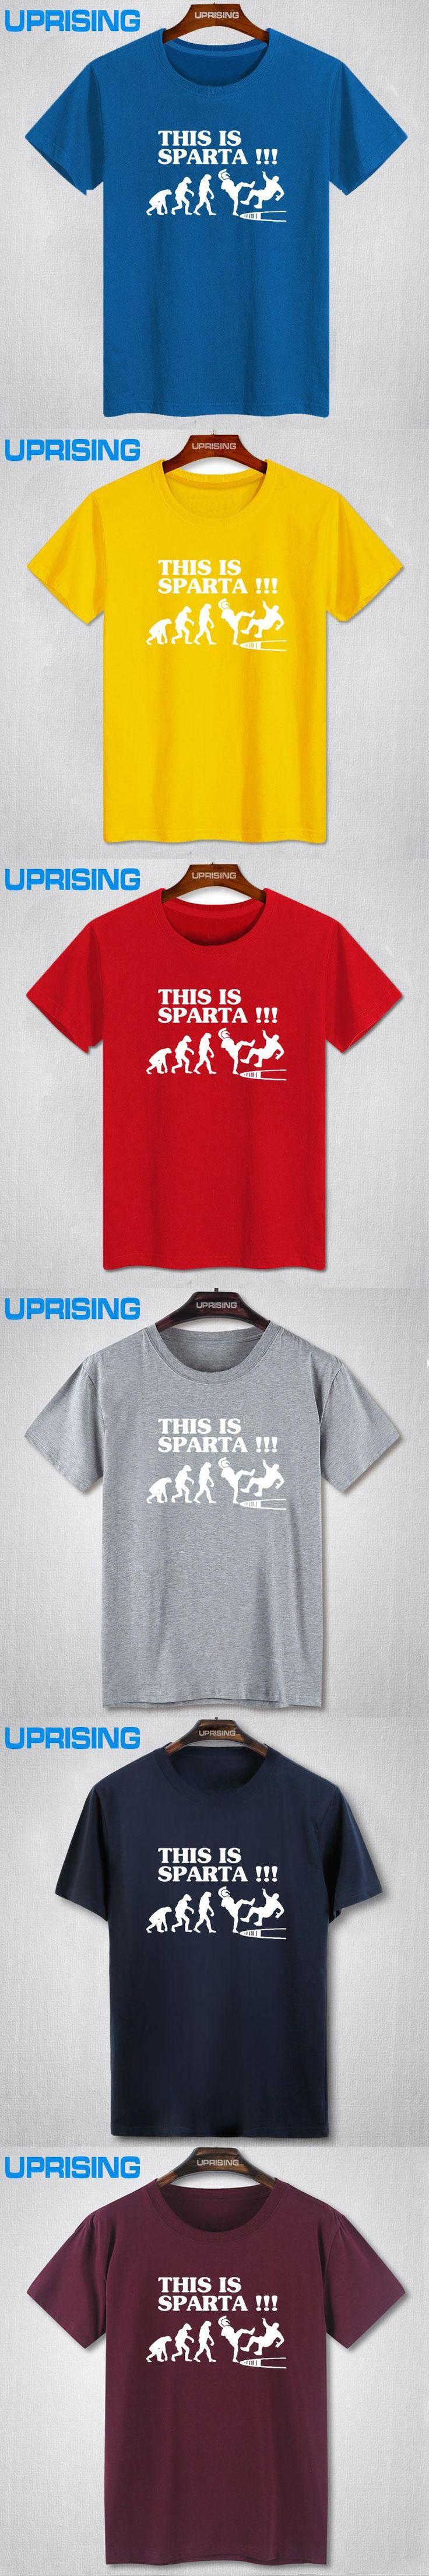 Fashion Superman T-shirts Summer Mens This Is Sparta Evolution Shirt 300 King Of Sparta Tee 100% Cotton O-neck Printing Shirts